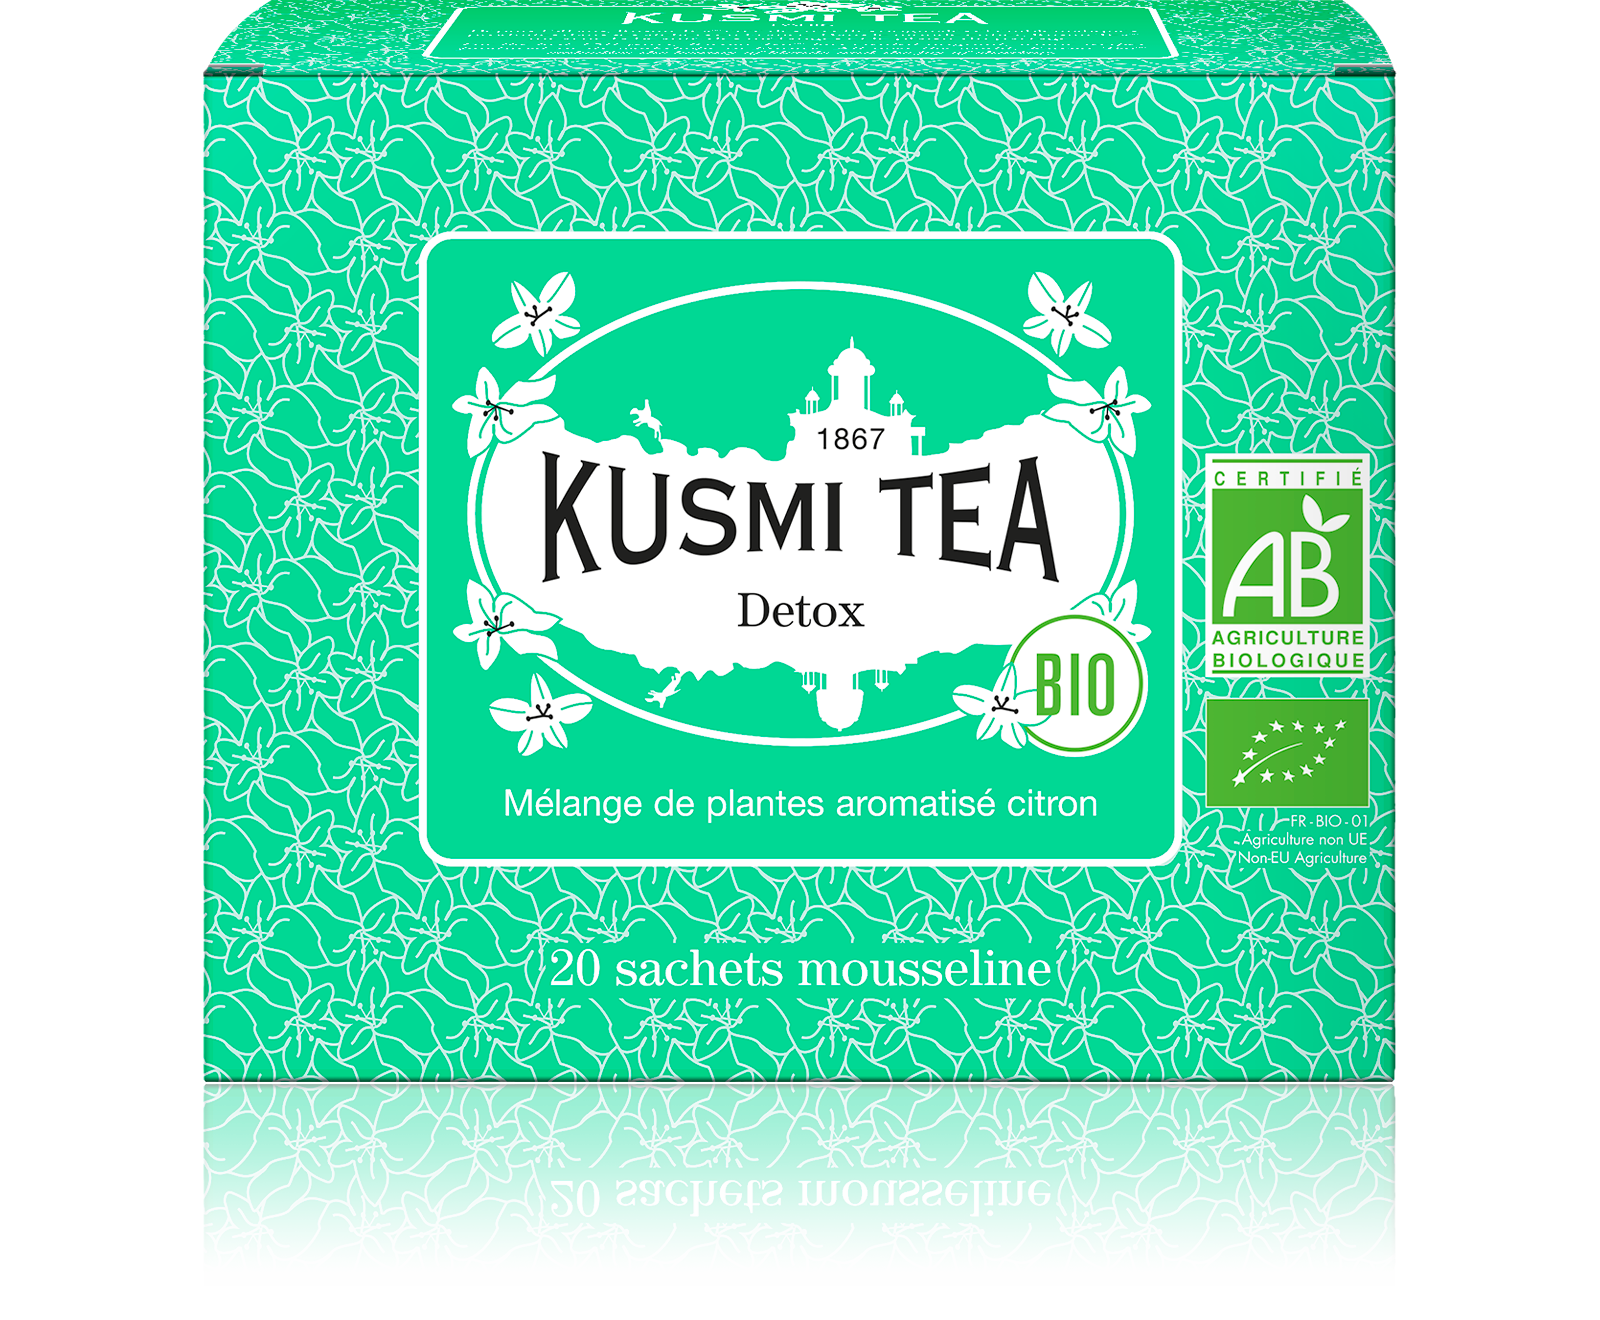 Thé vert, maté - Detox Bio - Sachets - Kusmi Tea